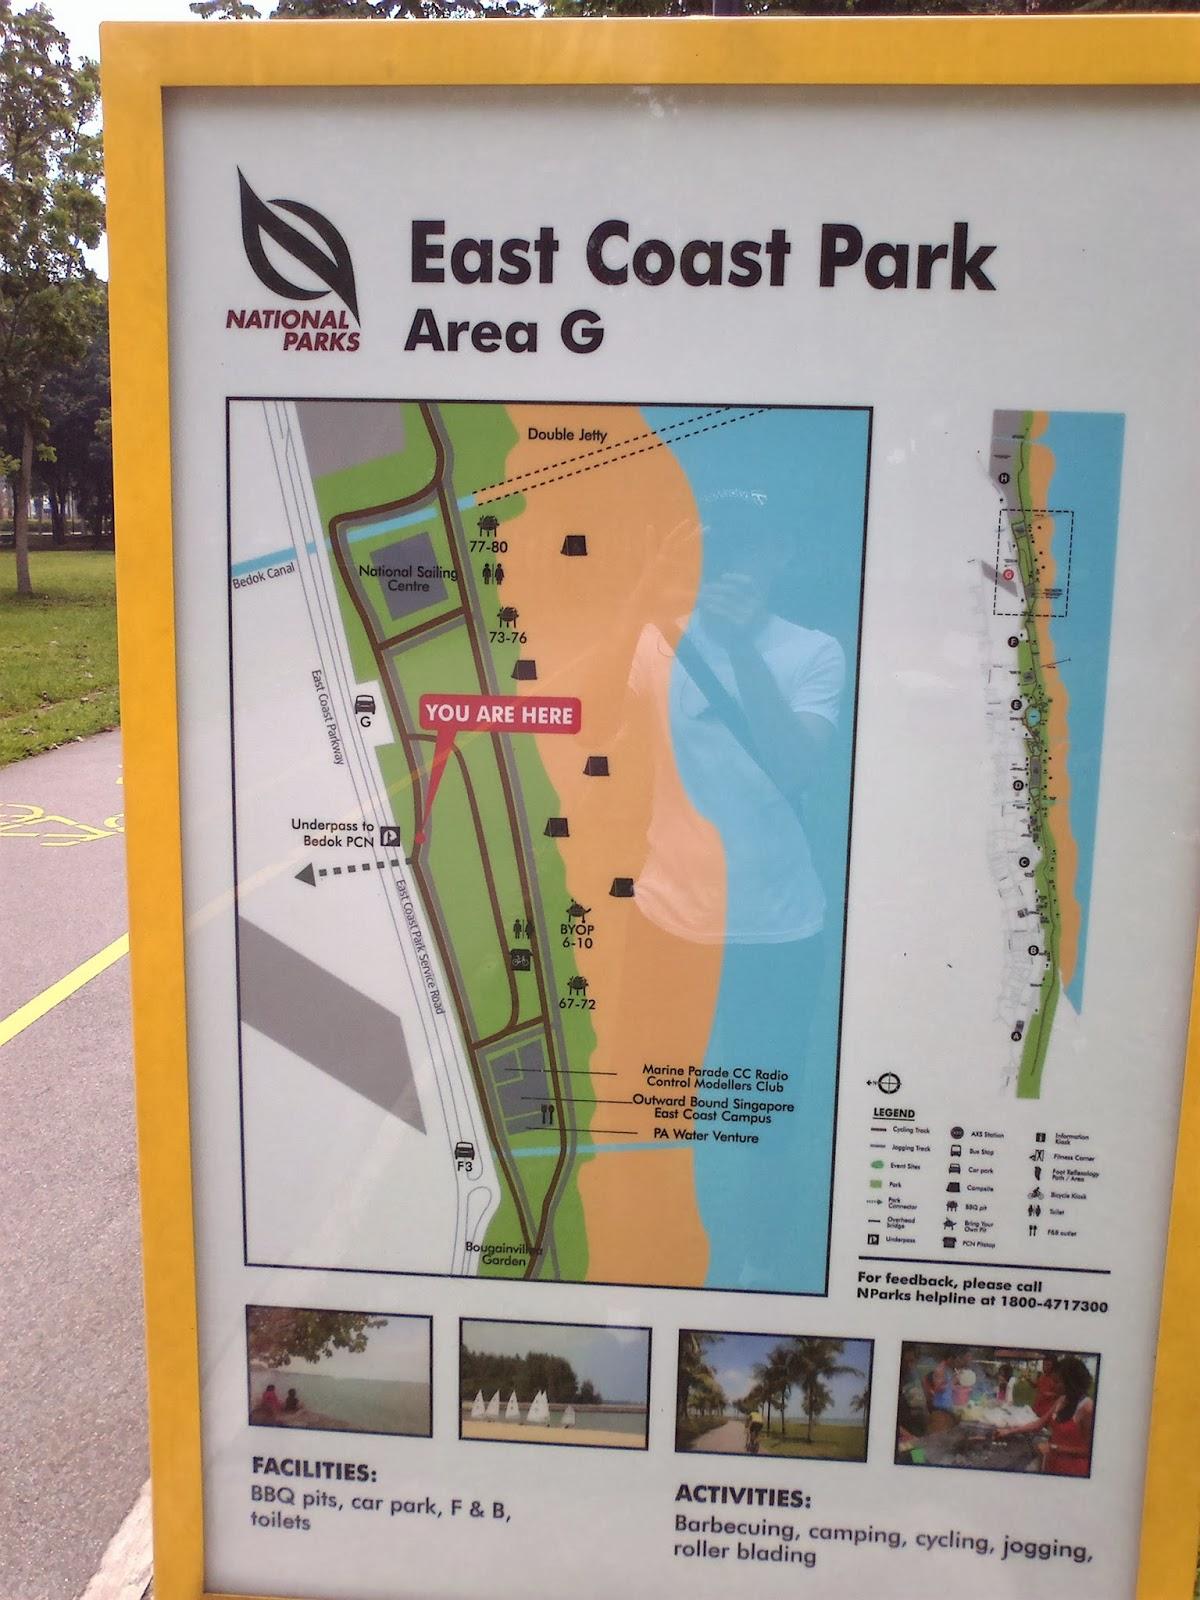 Georges Photos of Singapore Parks and Park Connectors Blog